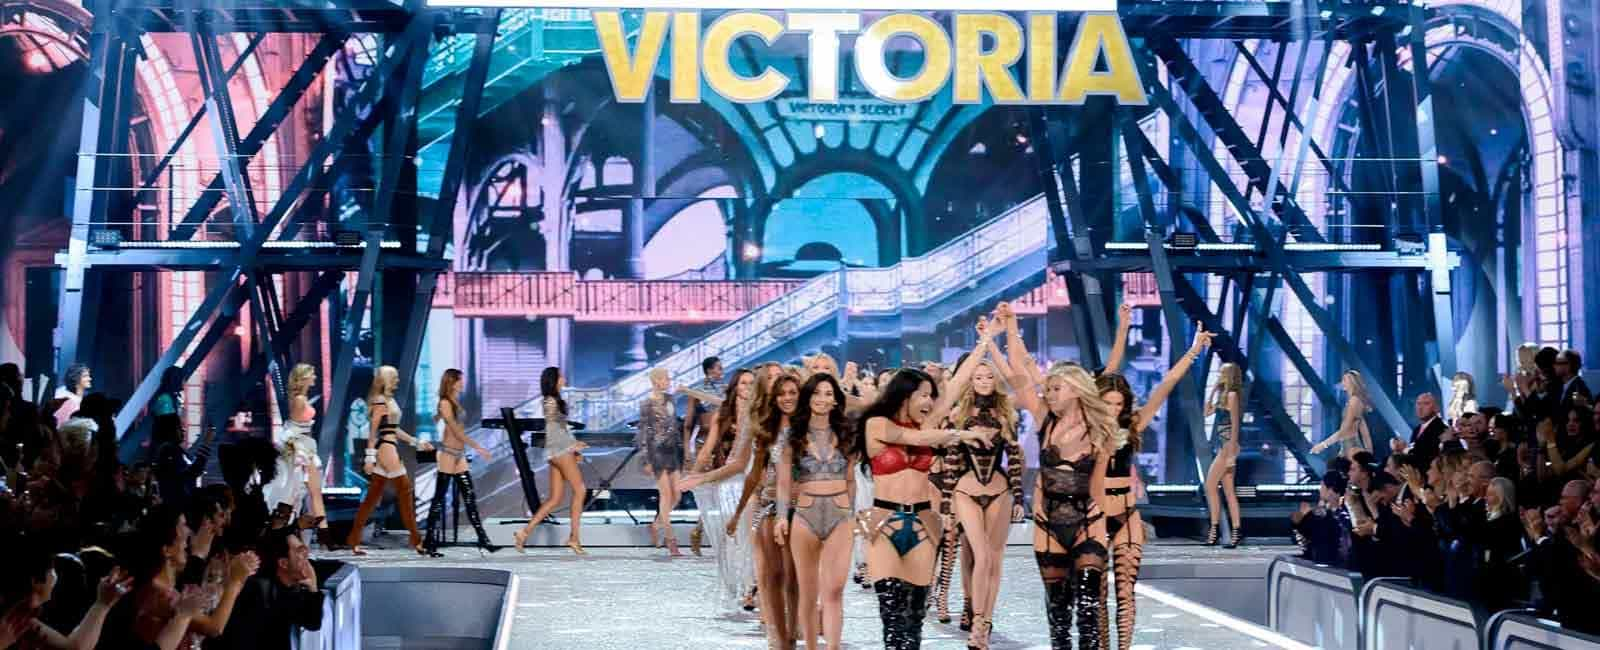 El Show de Victoria's Secret conquista París